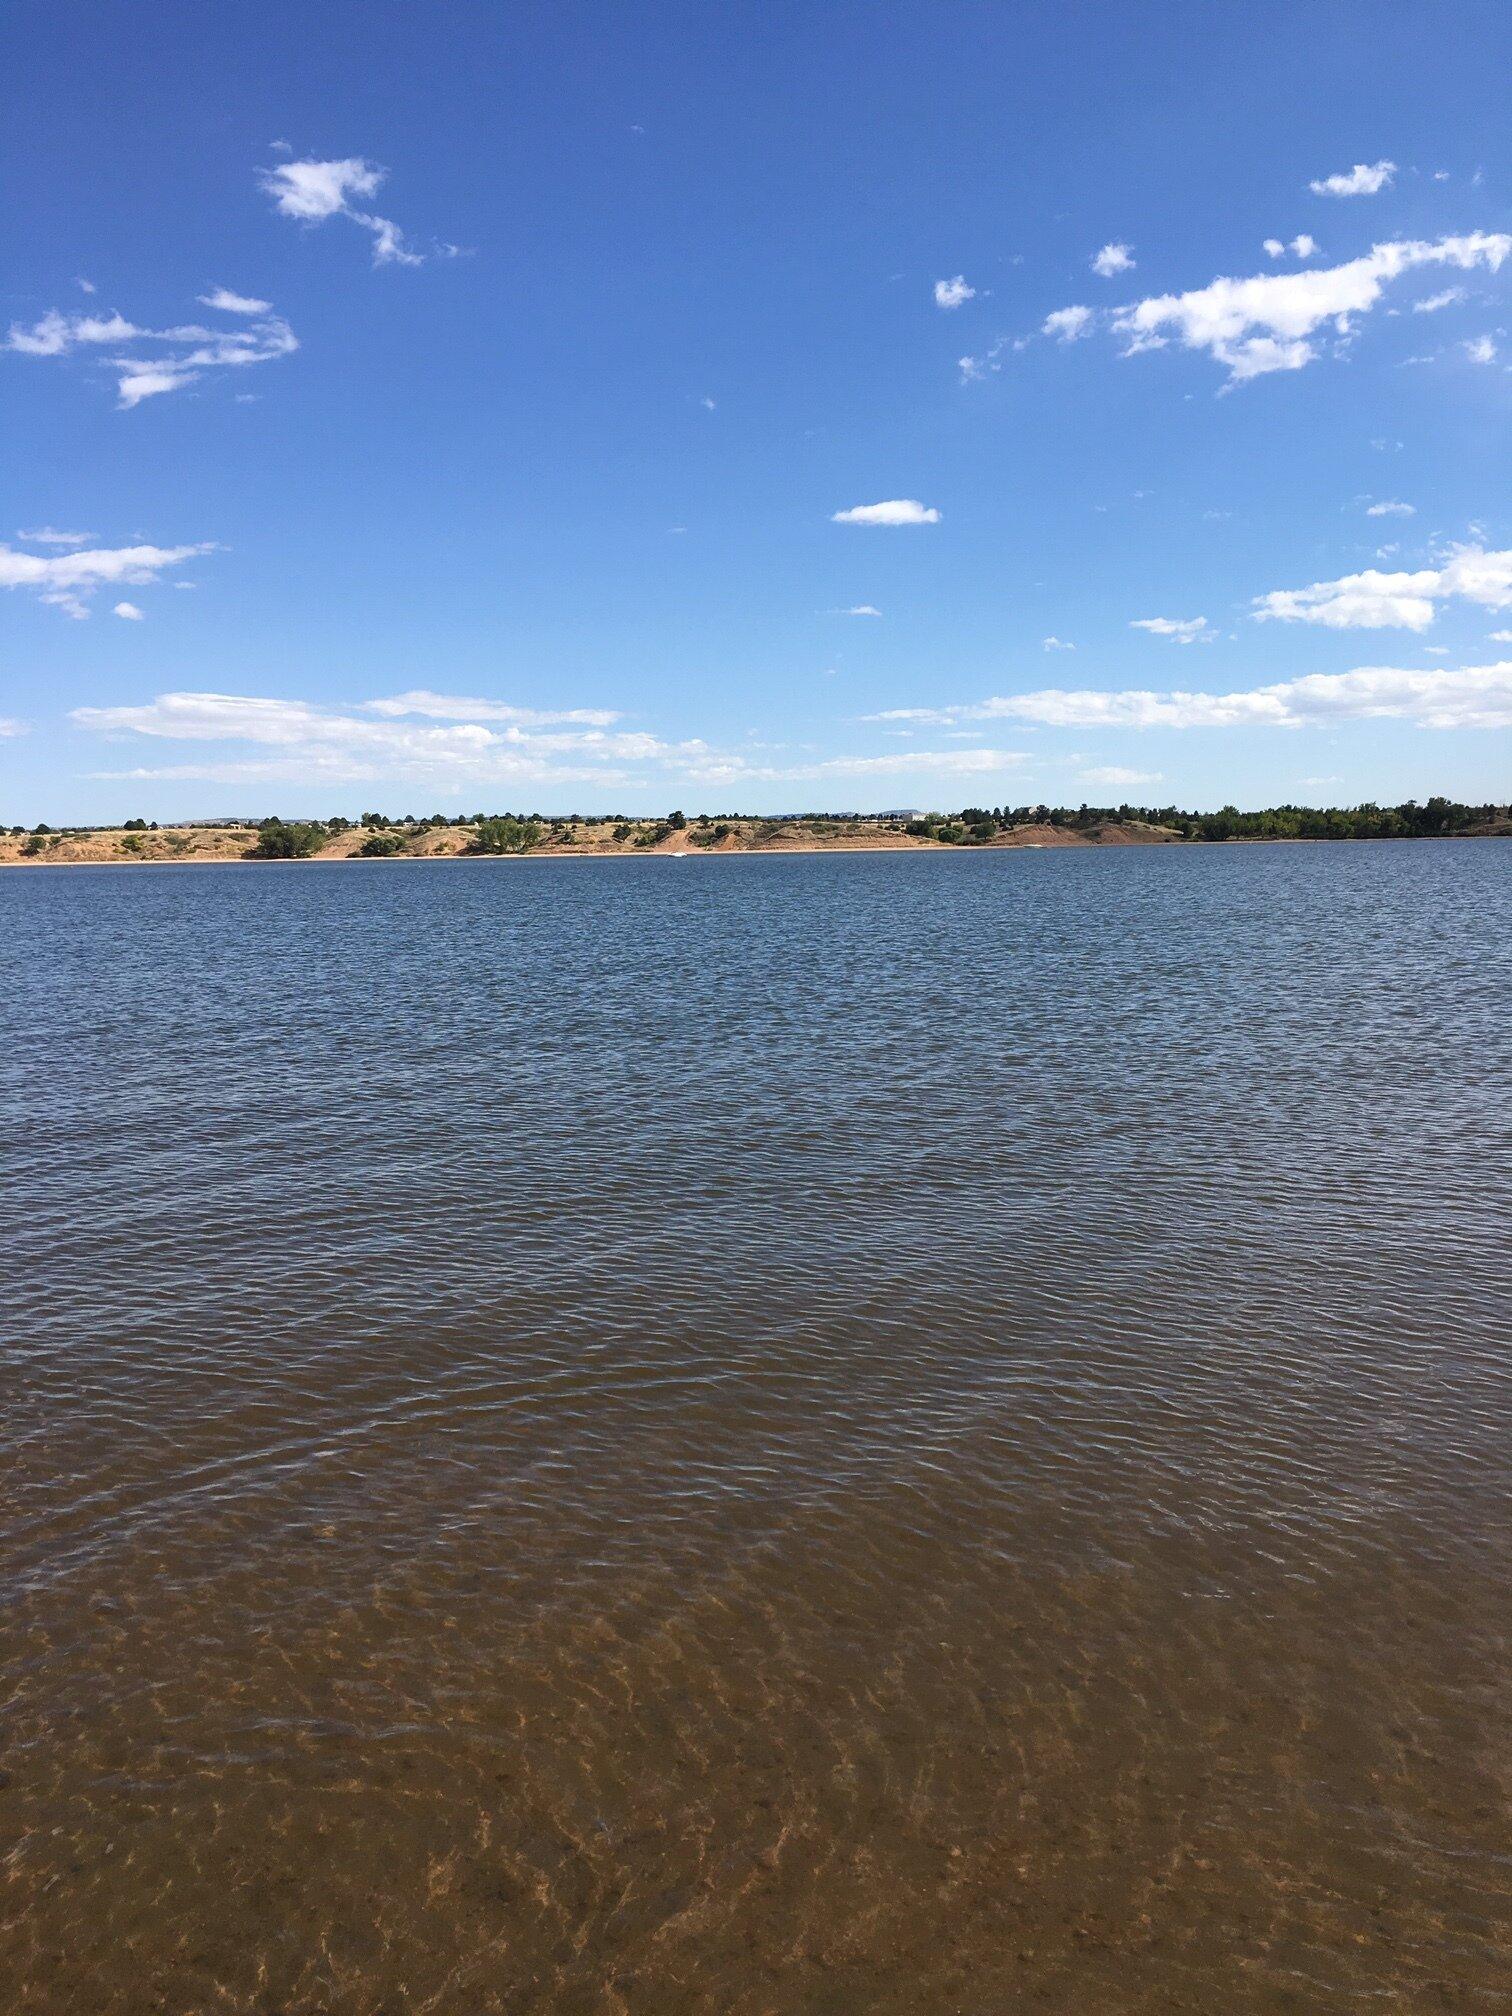 A lake in Colorado.